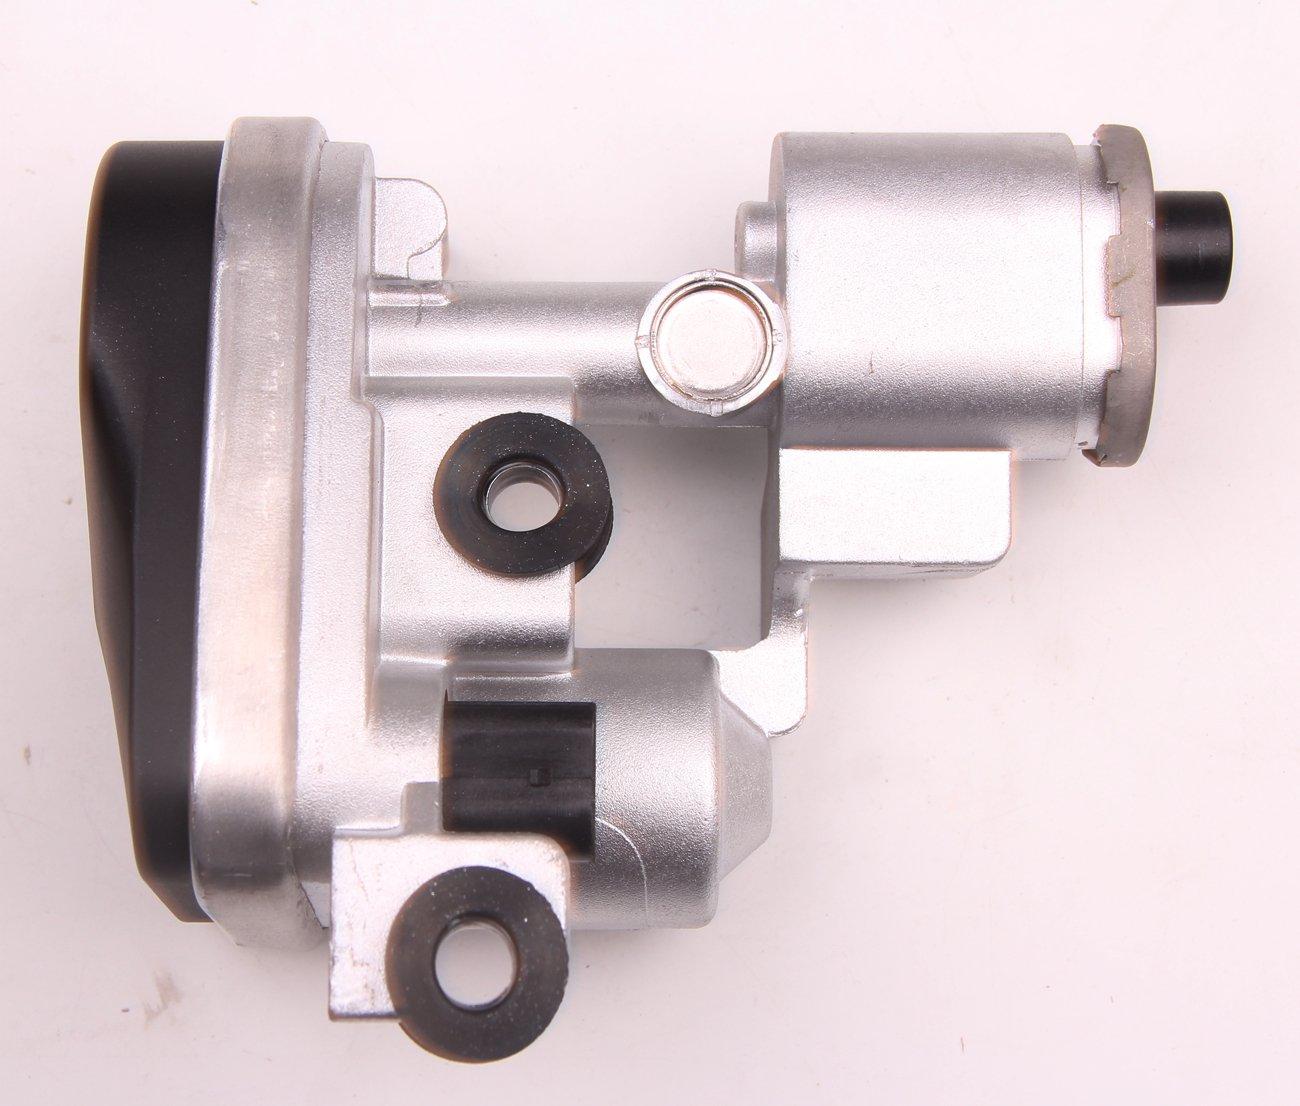 7 6 5 8 and Reverse Clutch Piston Dam ACDelco 24268950 GM Original Equipment Automatic Transmission 4